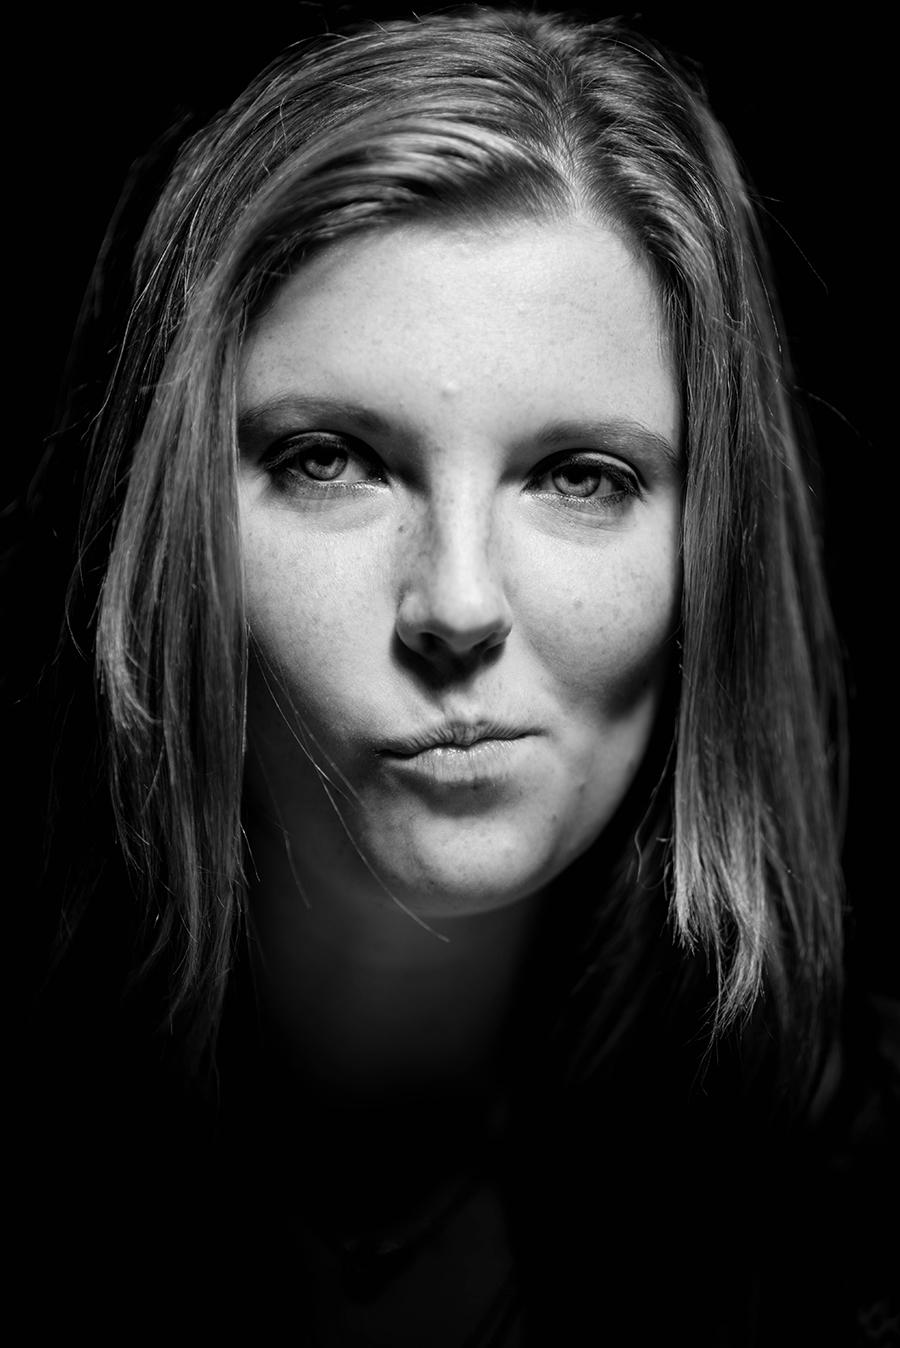 Hanna_A1_Despair_photography_model_photo_emotion_portrait_headshot_kaleb_germinaro.jpg